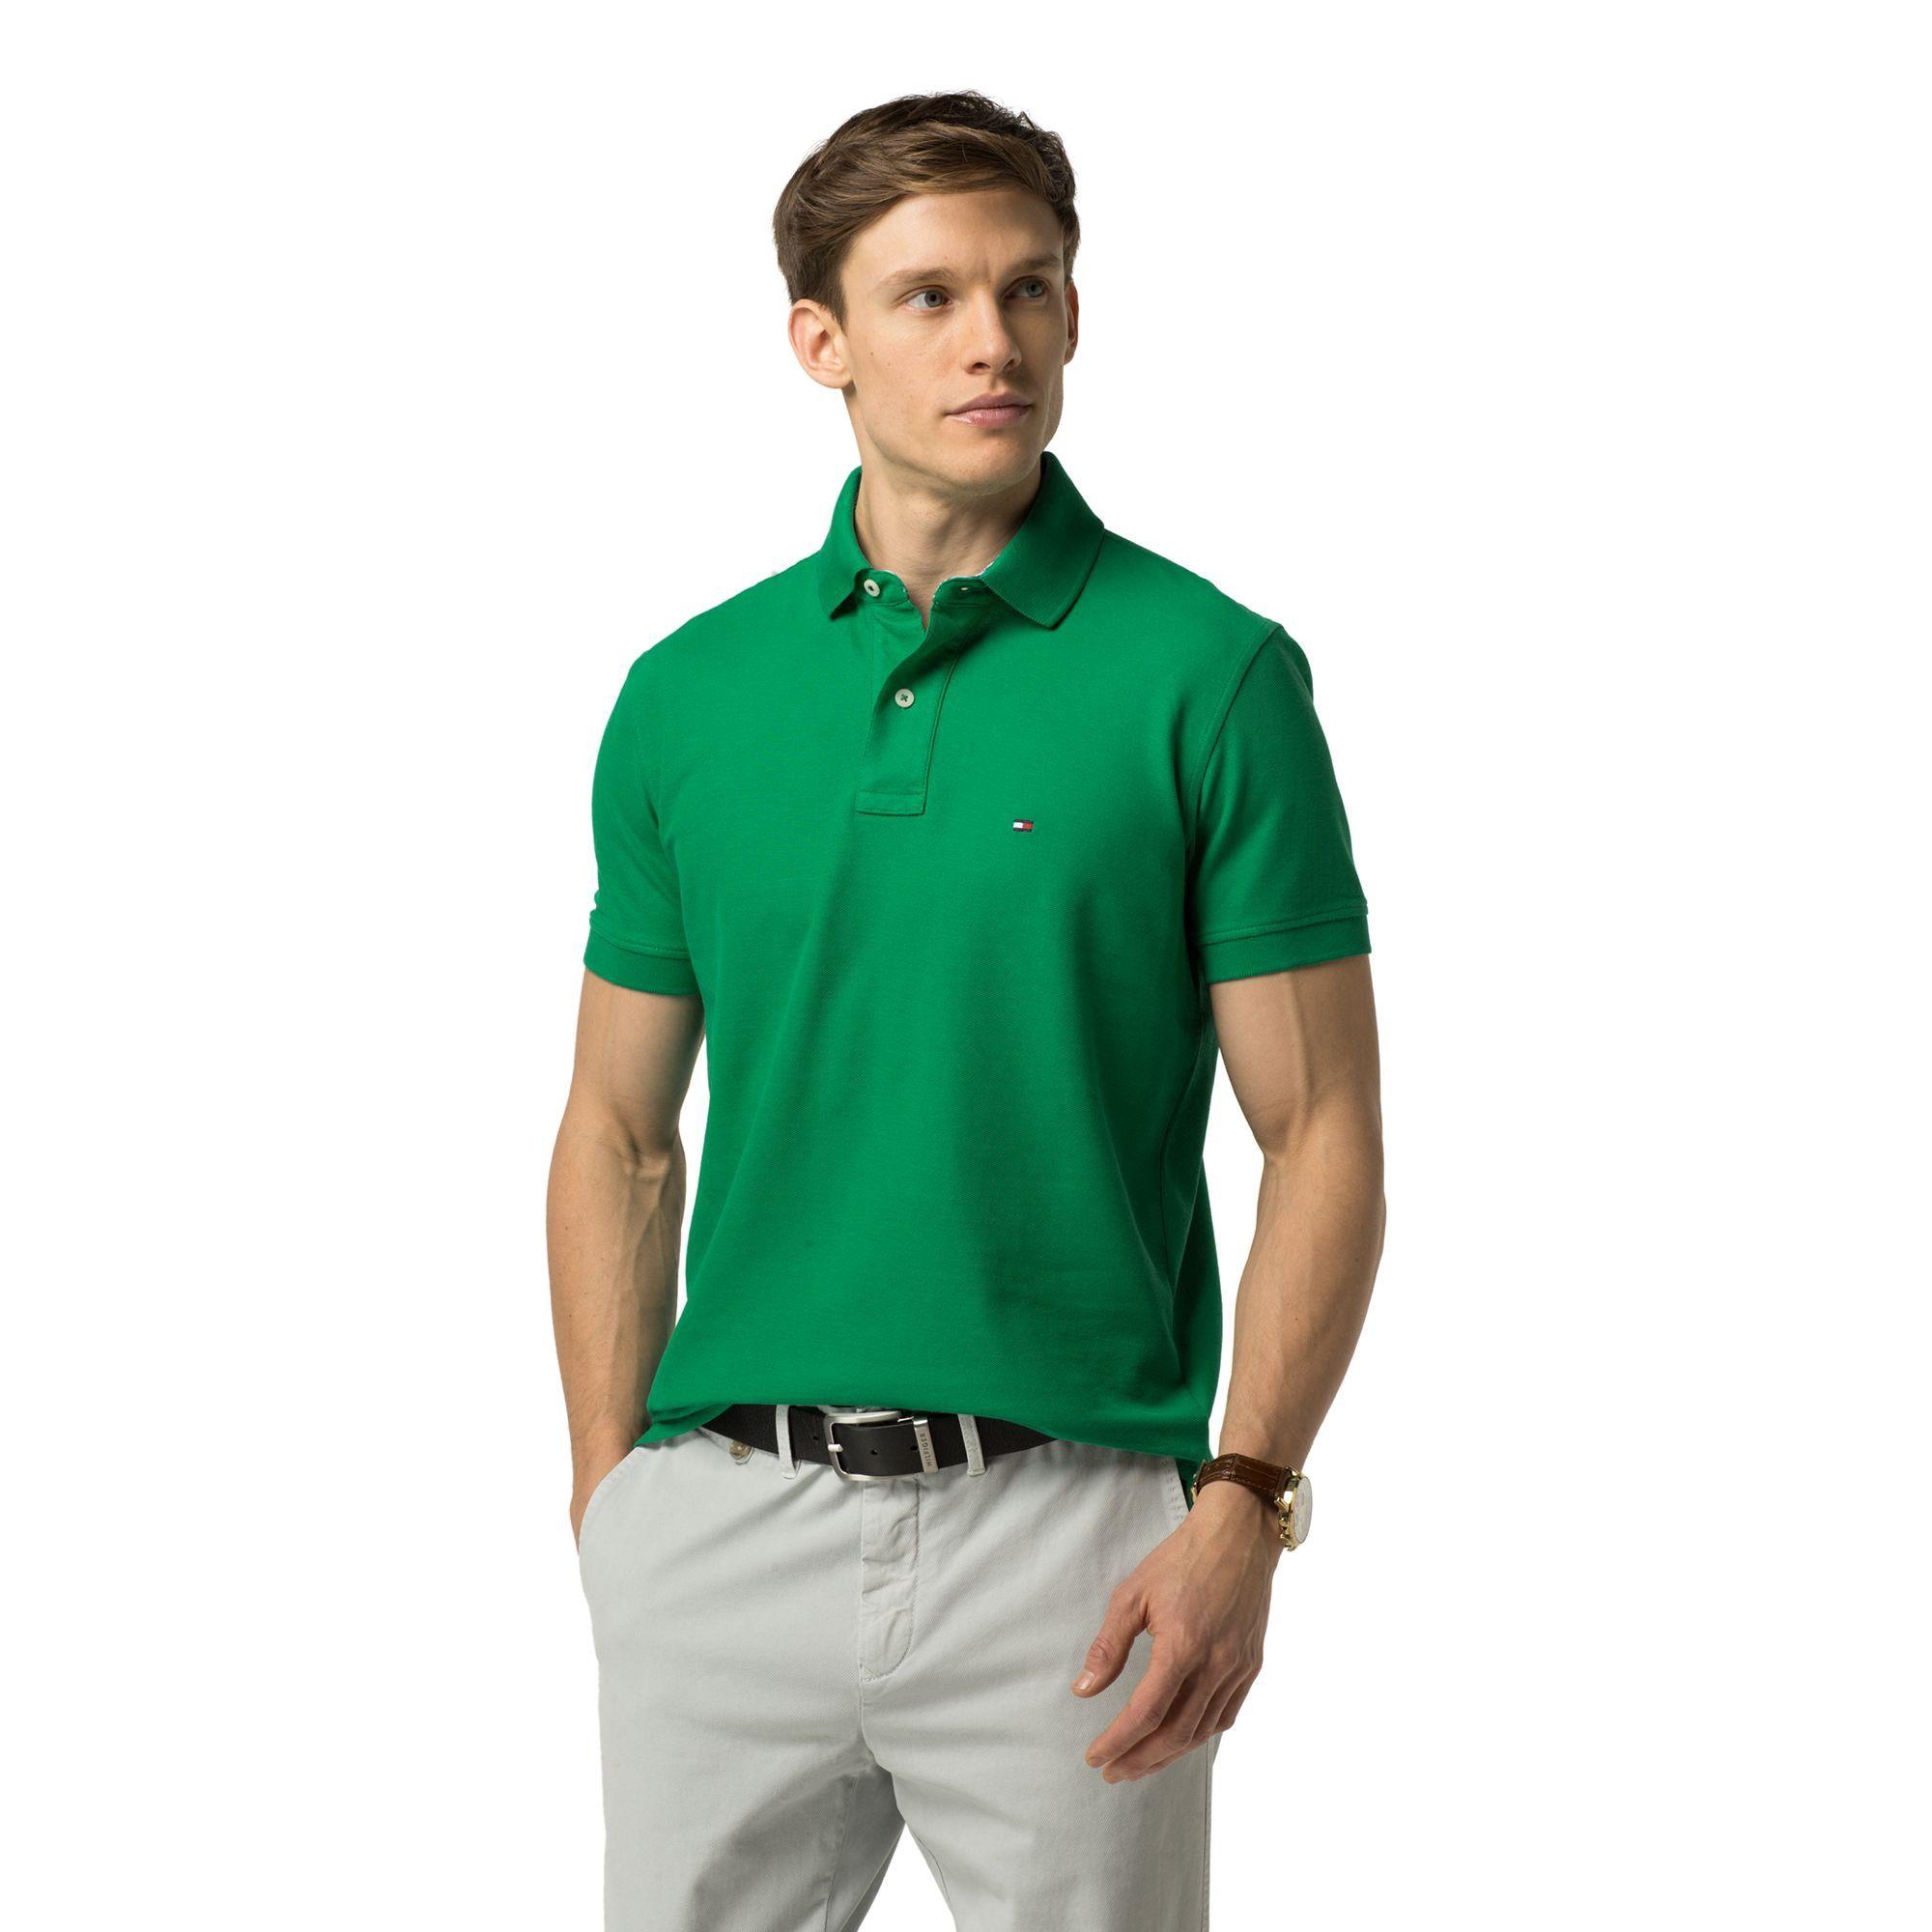 0f5f14d7782d TOMMY HILFIGER Regular Fit Premium Pique Polo - Golf Green.  tommyhilfiger   cloth  all